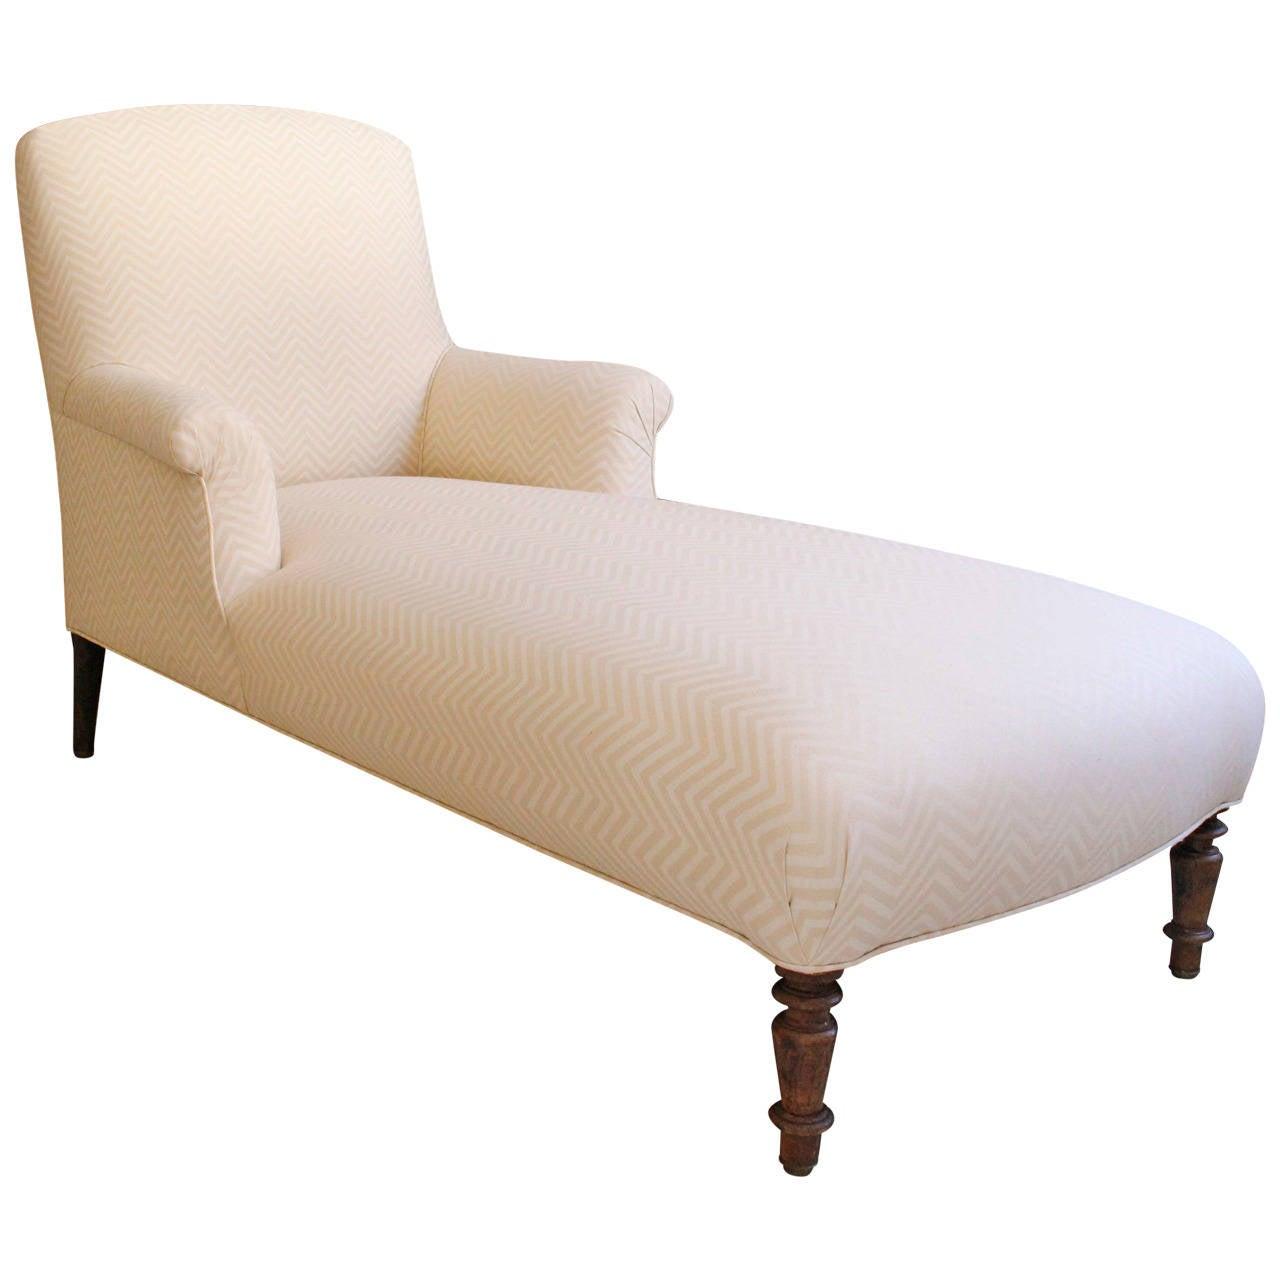 napoleon iii chaise longue at 1stdibs. Black Bedroom Furniture Sets. Home Design Ideas